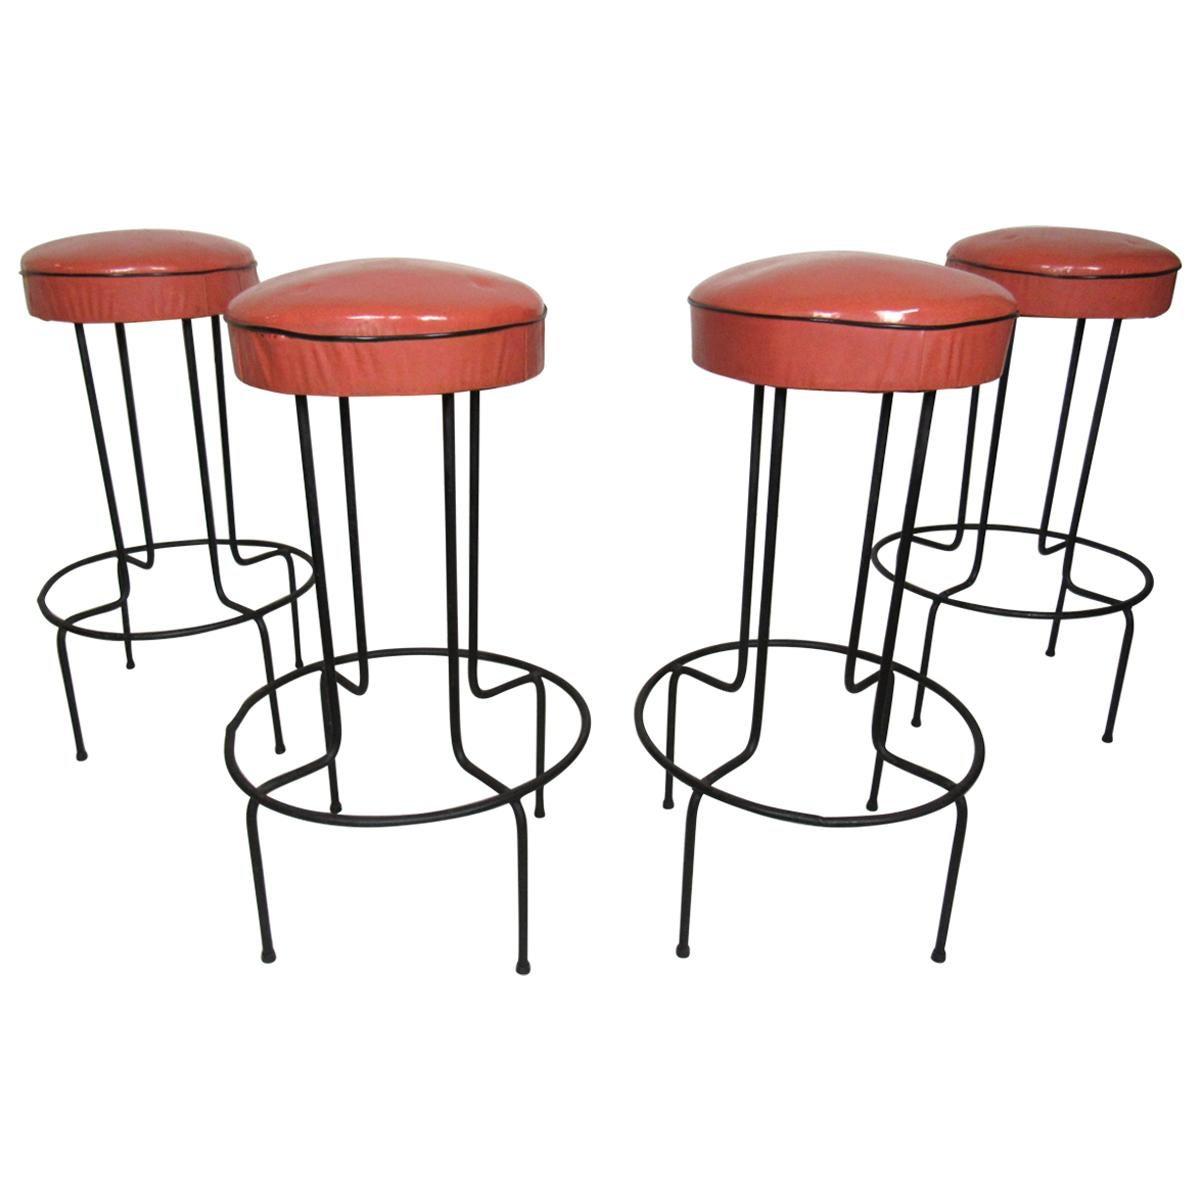 Set of Four Midcentury Barstools